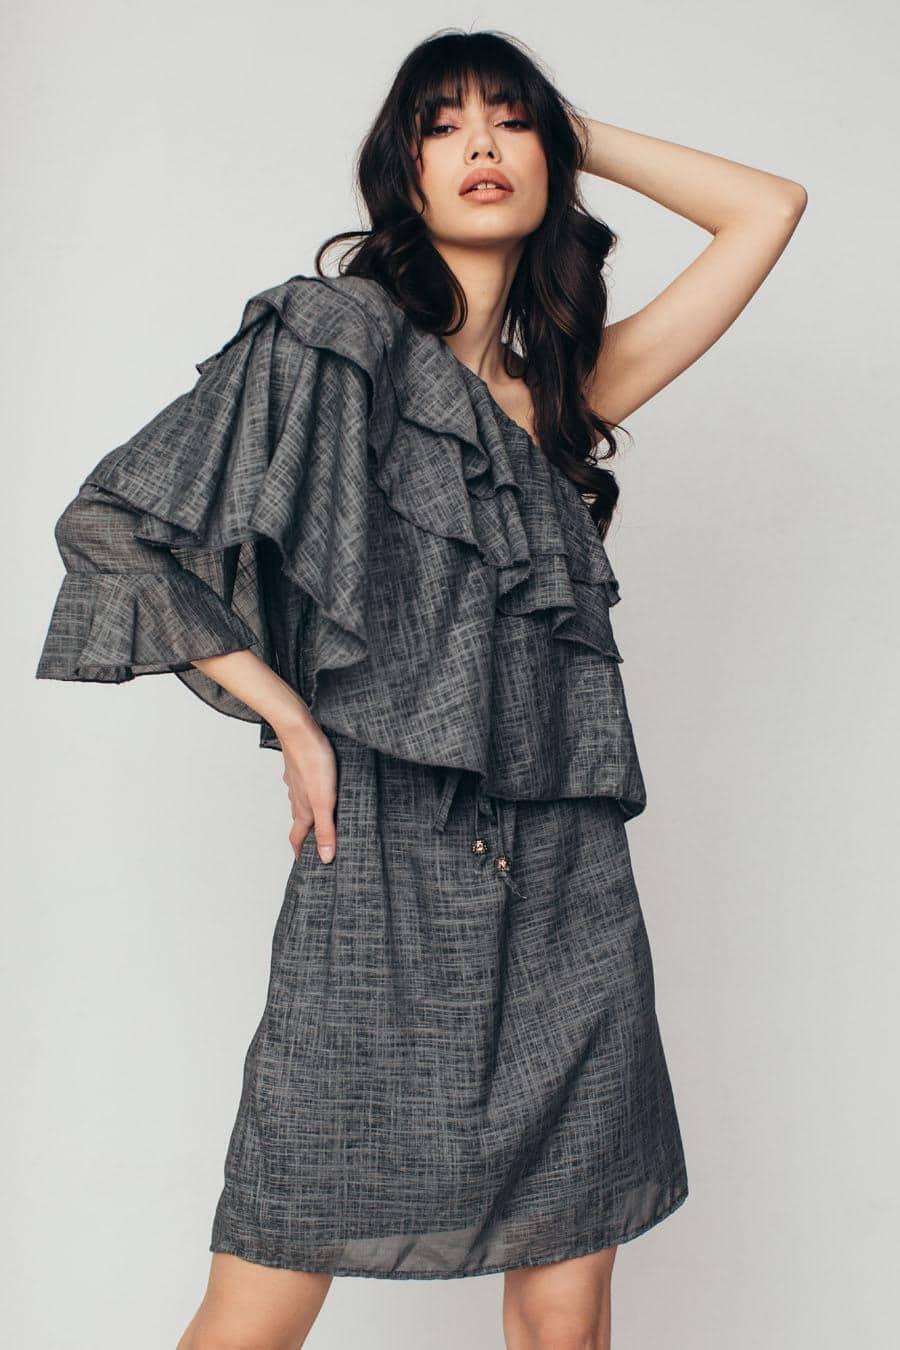 jagger zenska haljina kolekcija prolece leto 2021 ss 2021 kupi online jg 5504 19 02